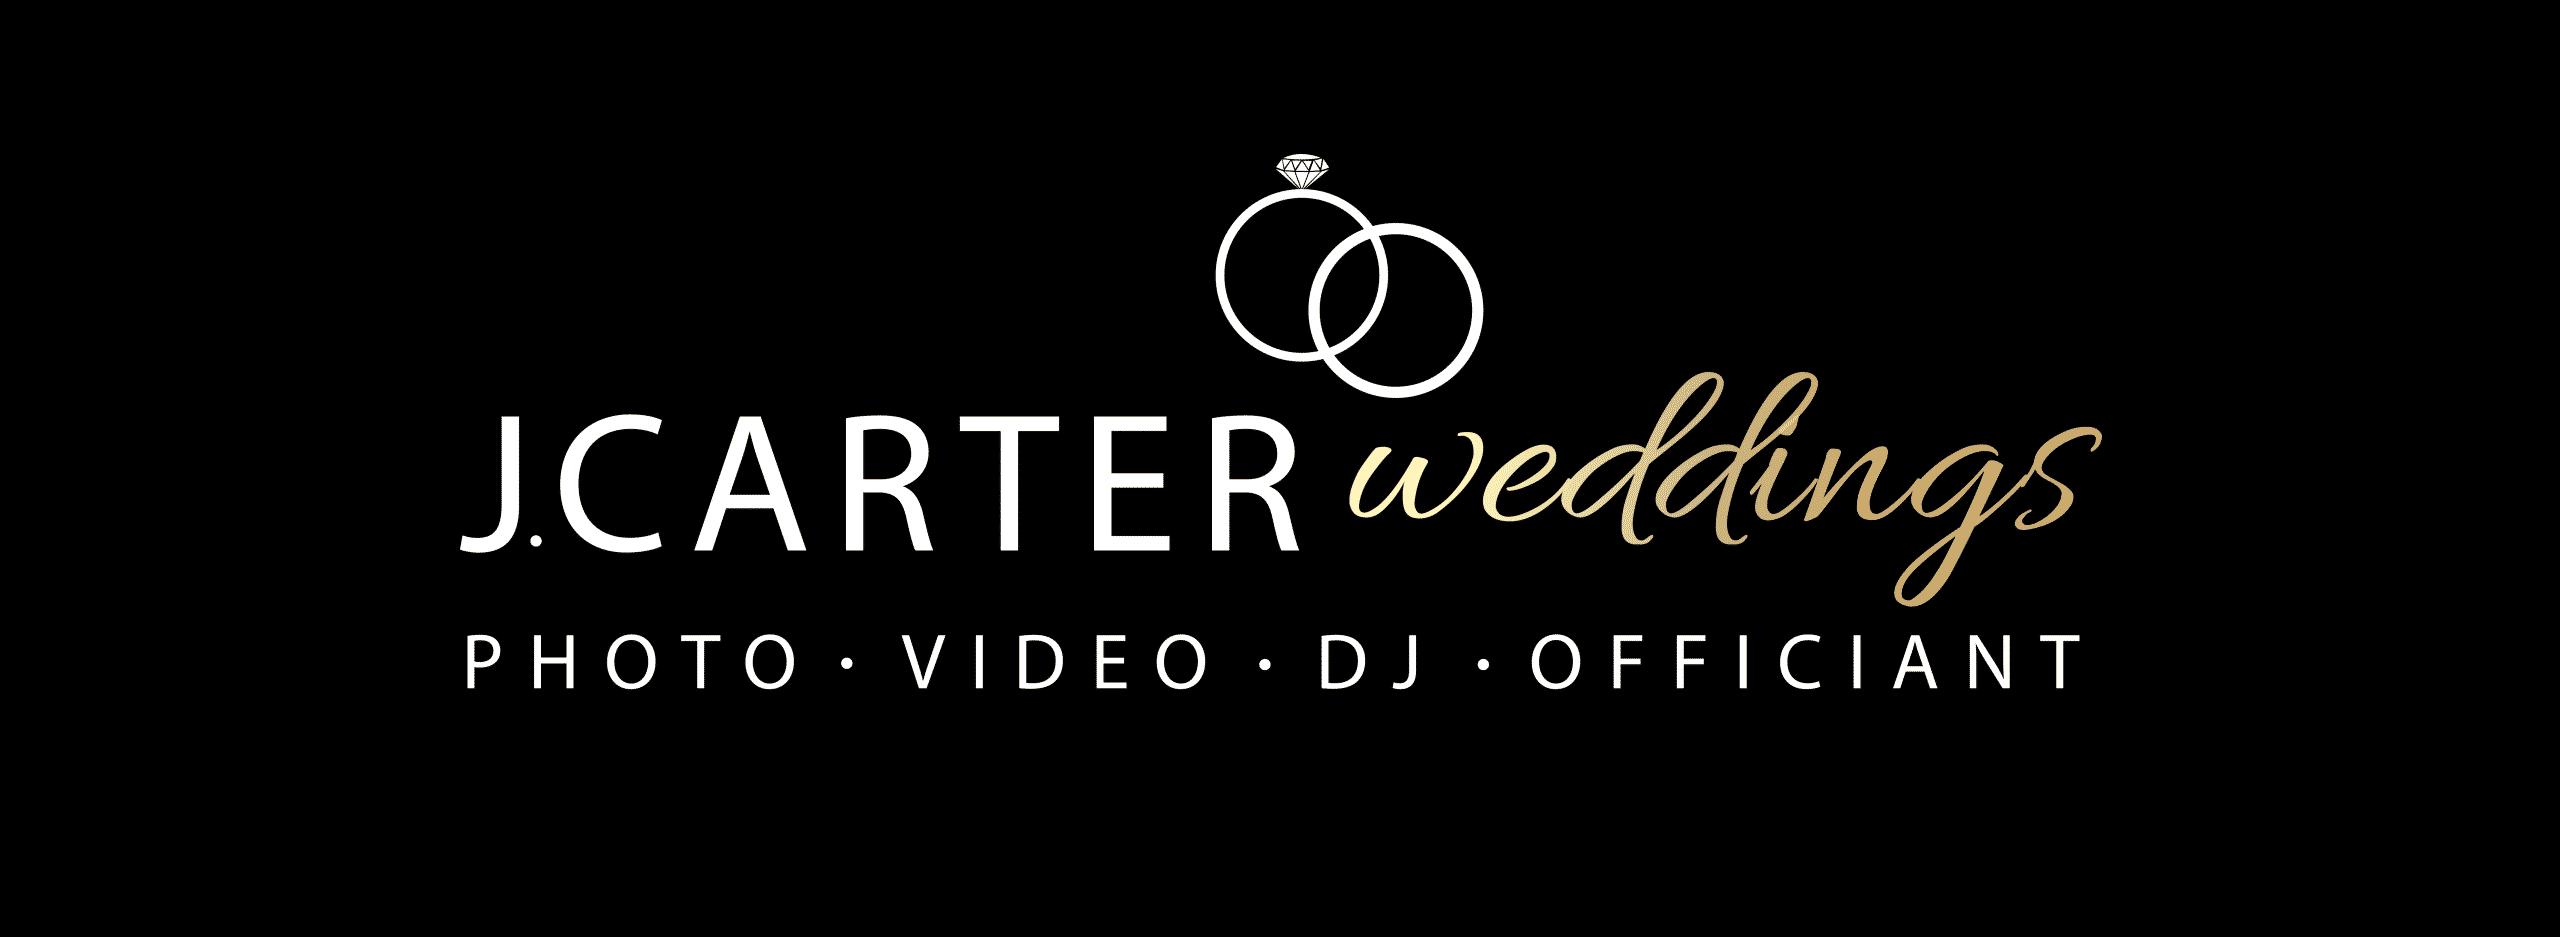 J Carter Weddings